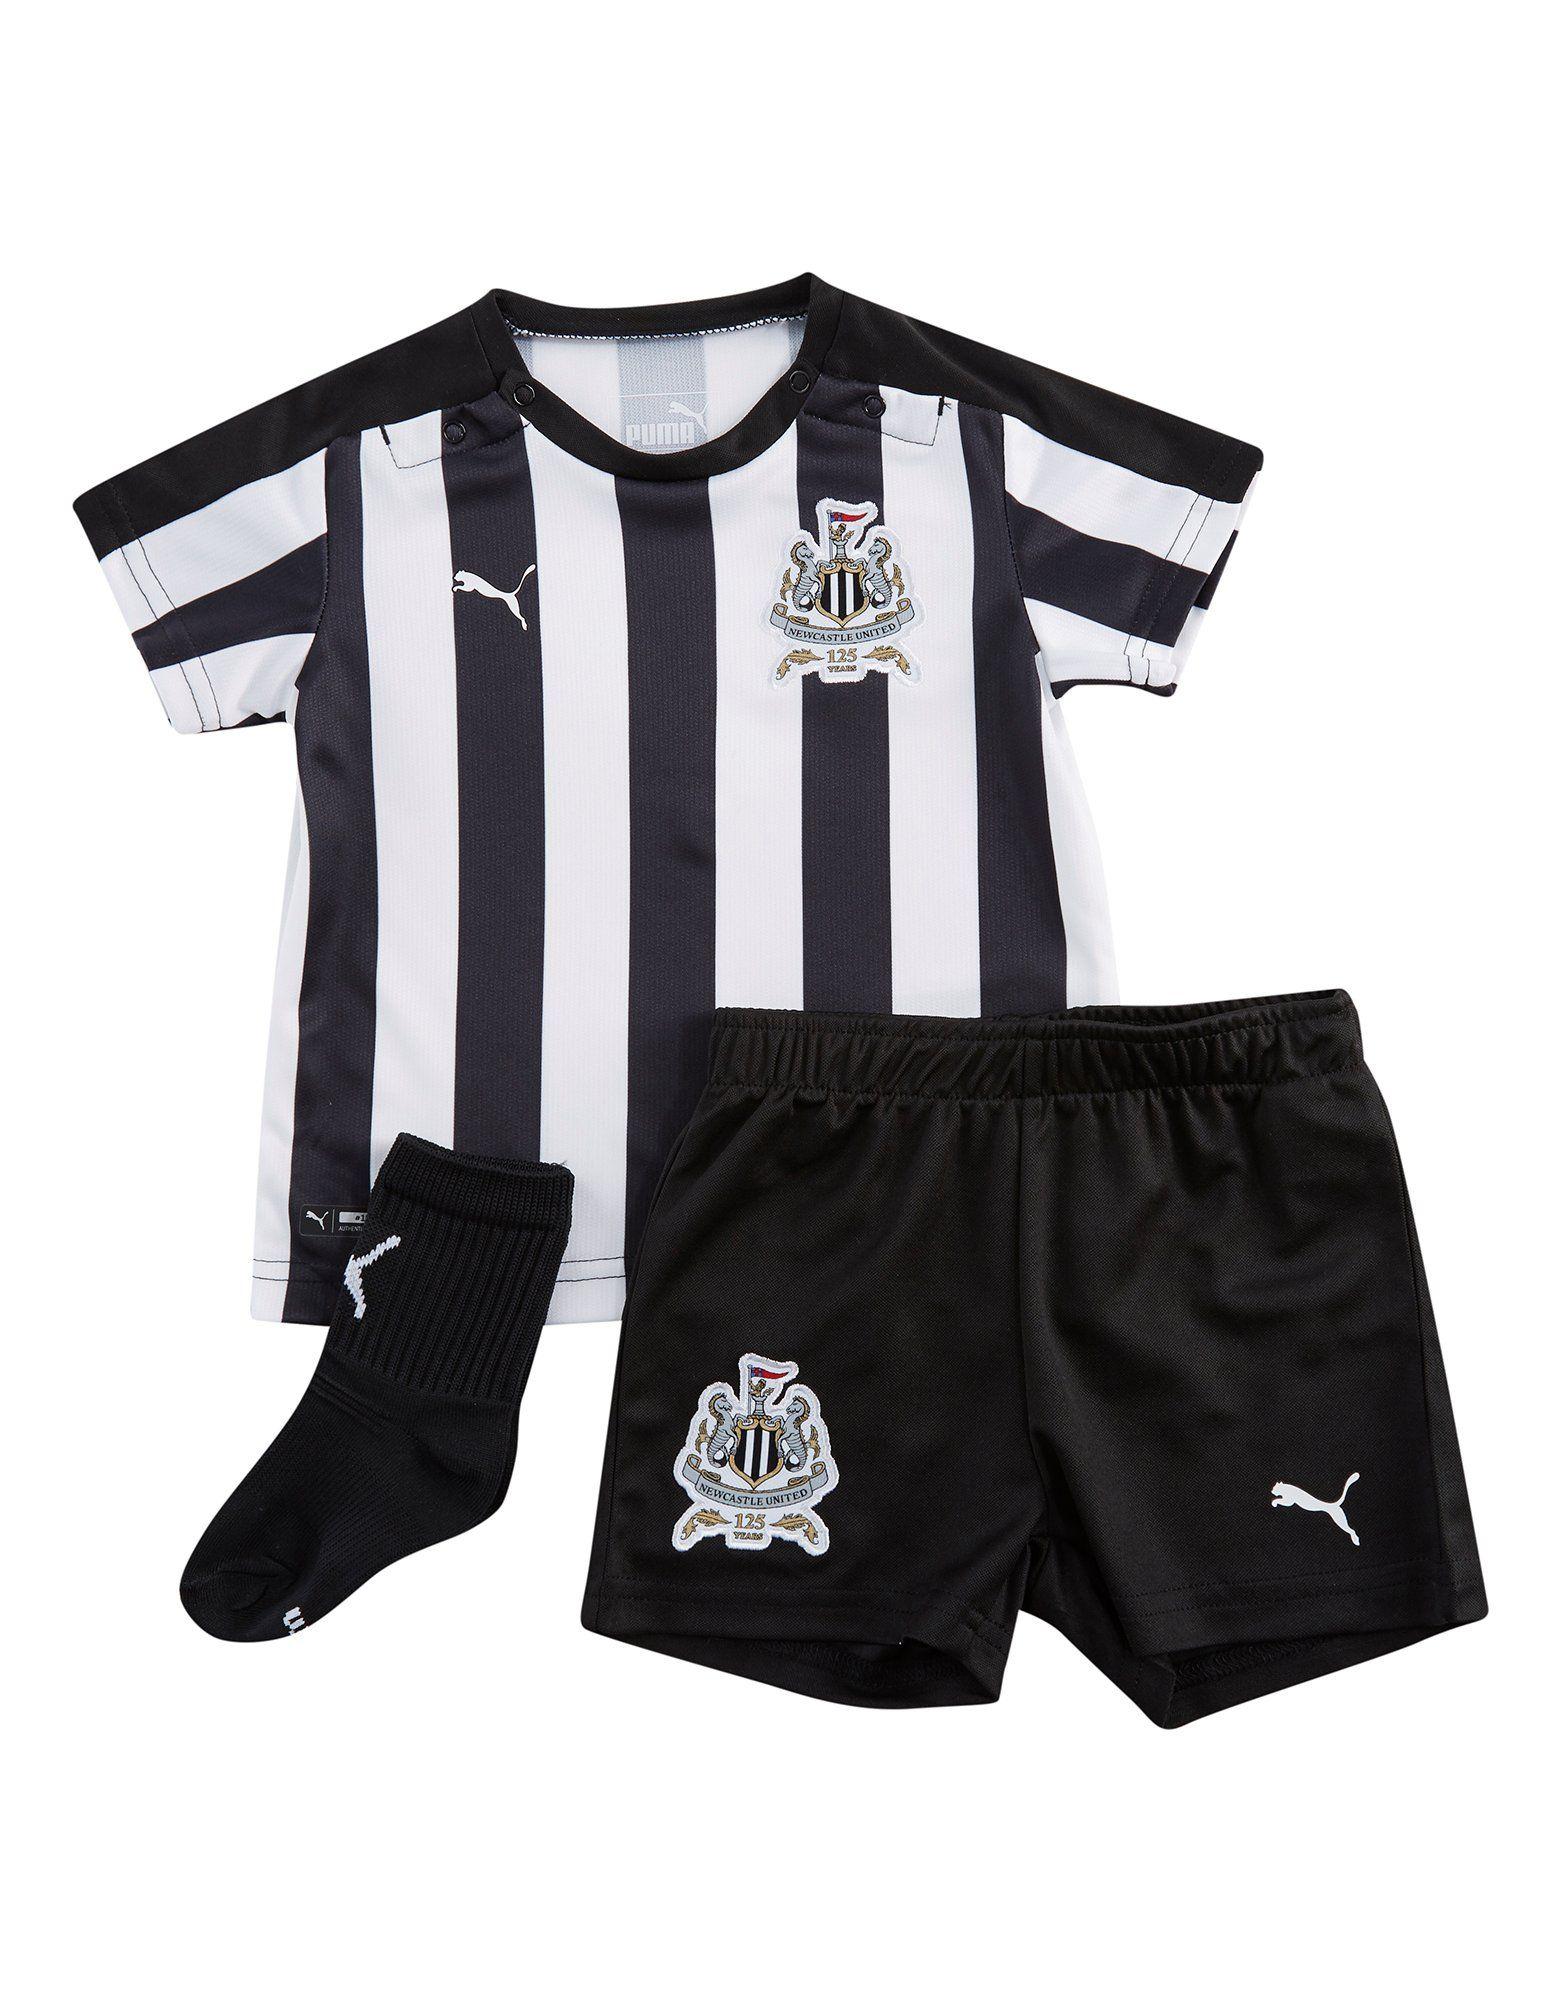 PUMA Newcastle United 2017/18 Home Kit Infant